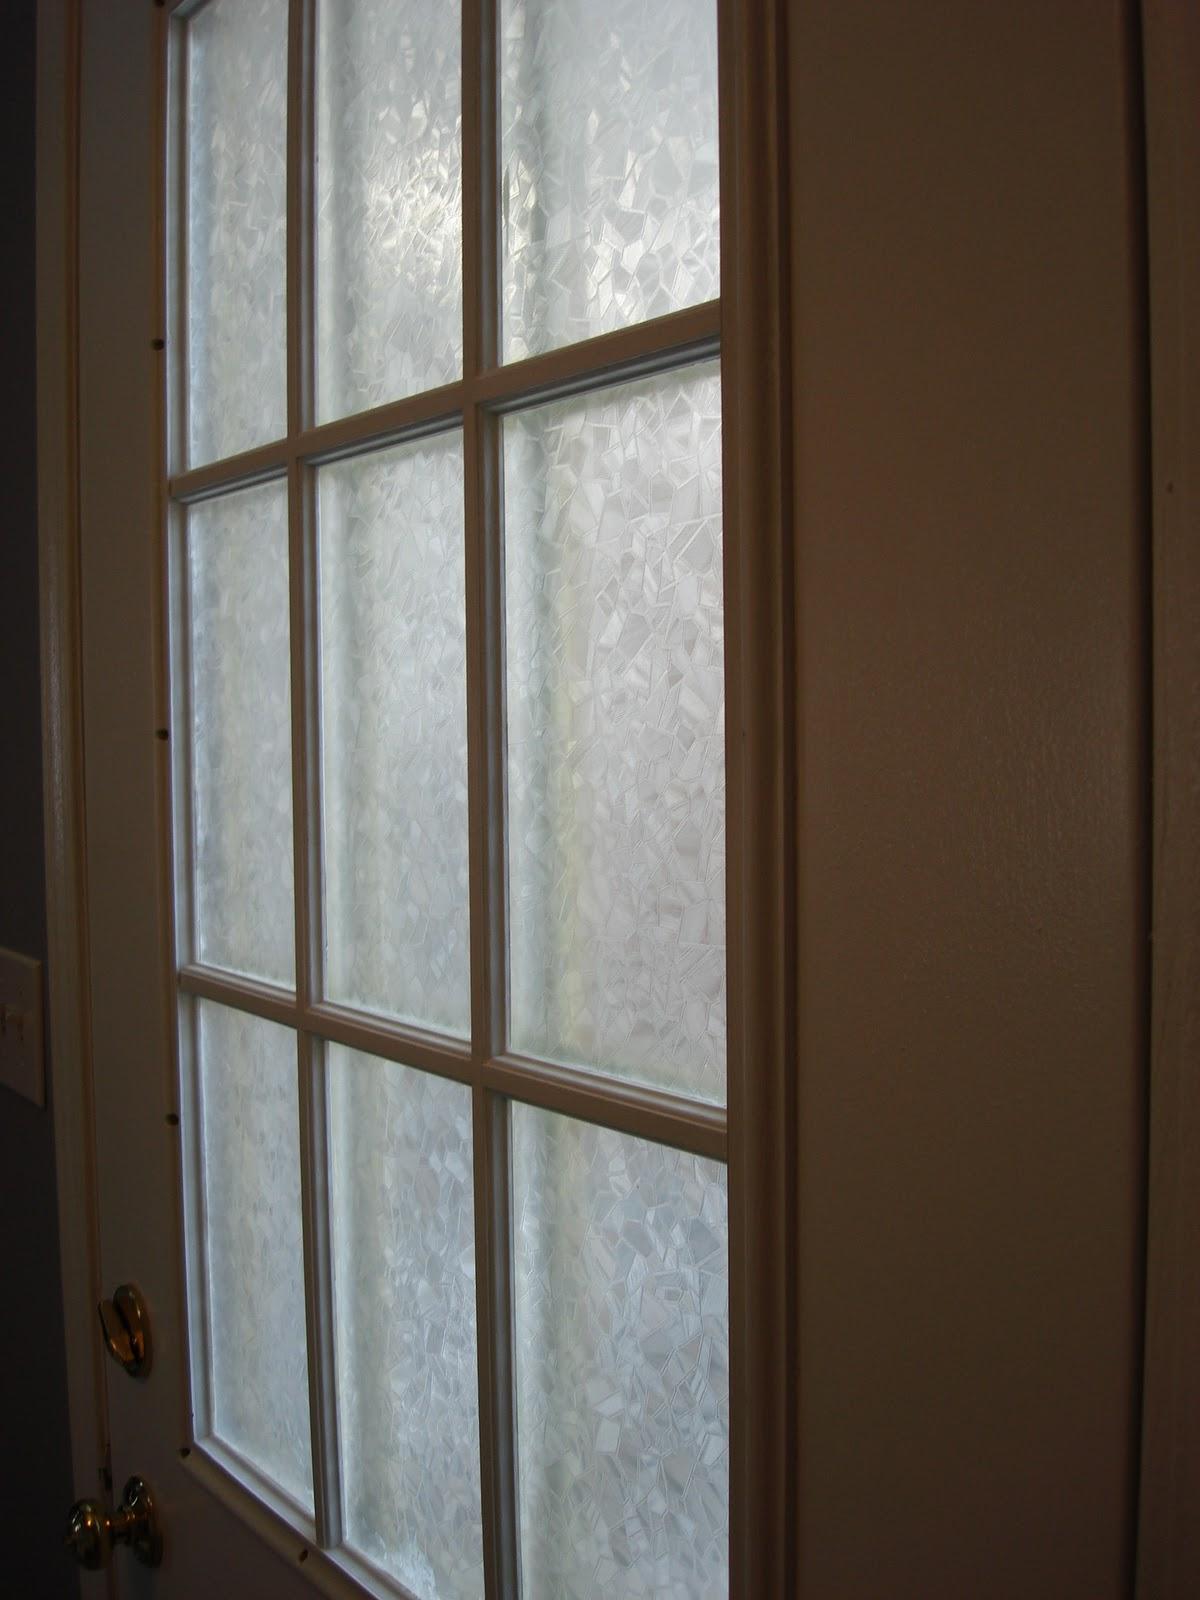 dg style front door window treatment. Black Bedroom Furniture Sets. Home Design Ideas